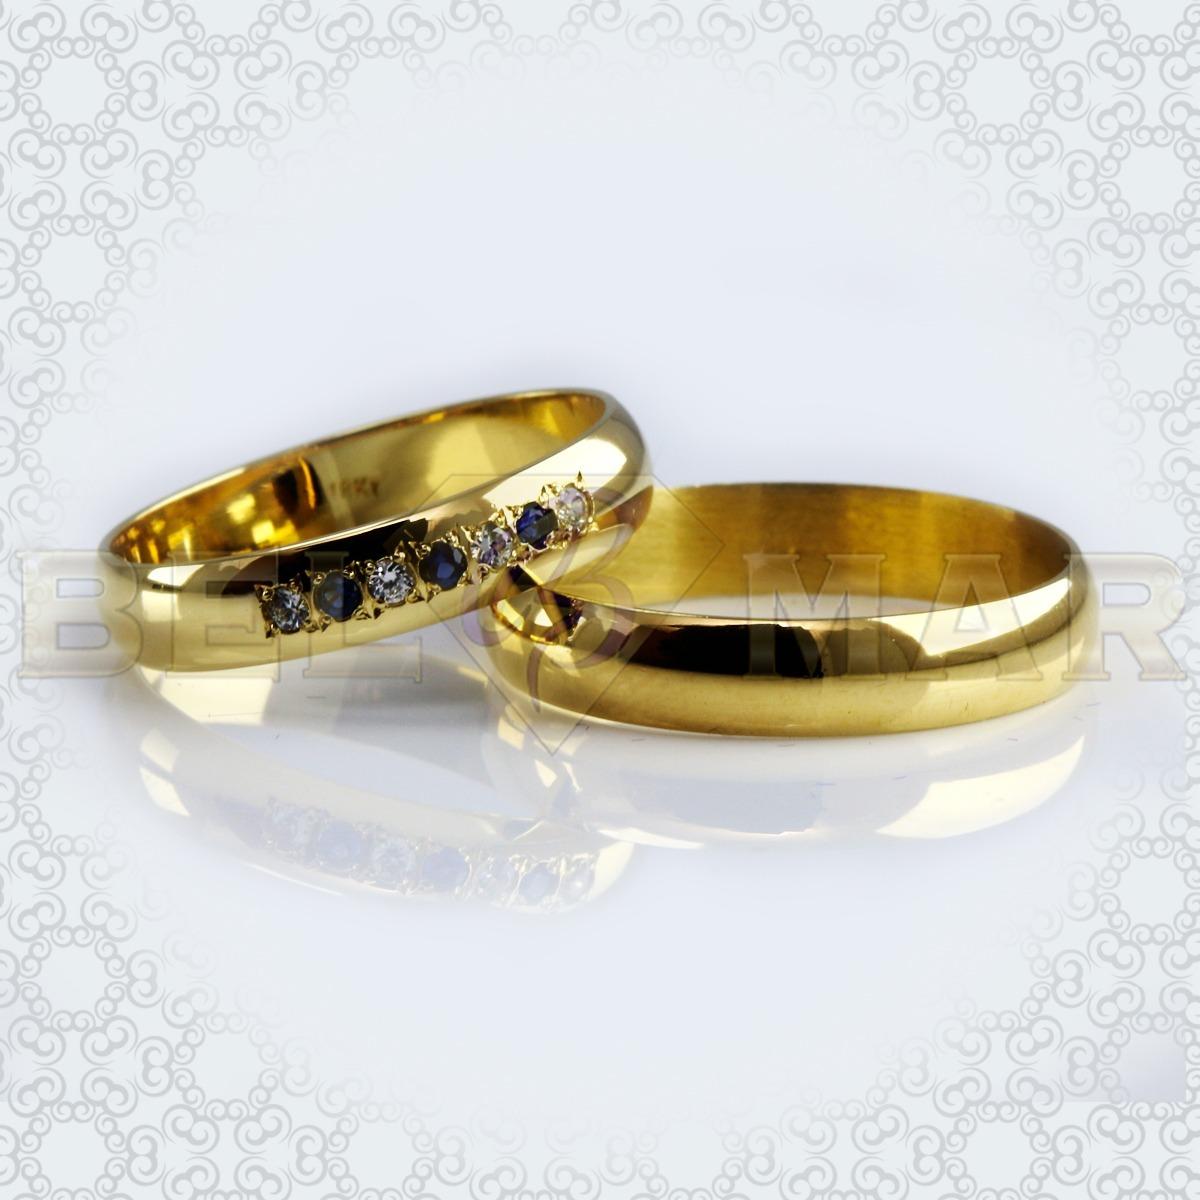 7b7172e4b529 Par Alianzas 1 2 Caña 6 Gramos Oro 18 Kts Con Piedras 4 Mm ...